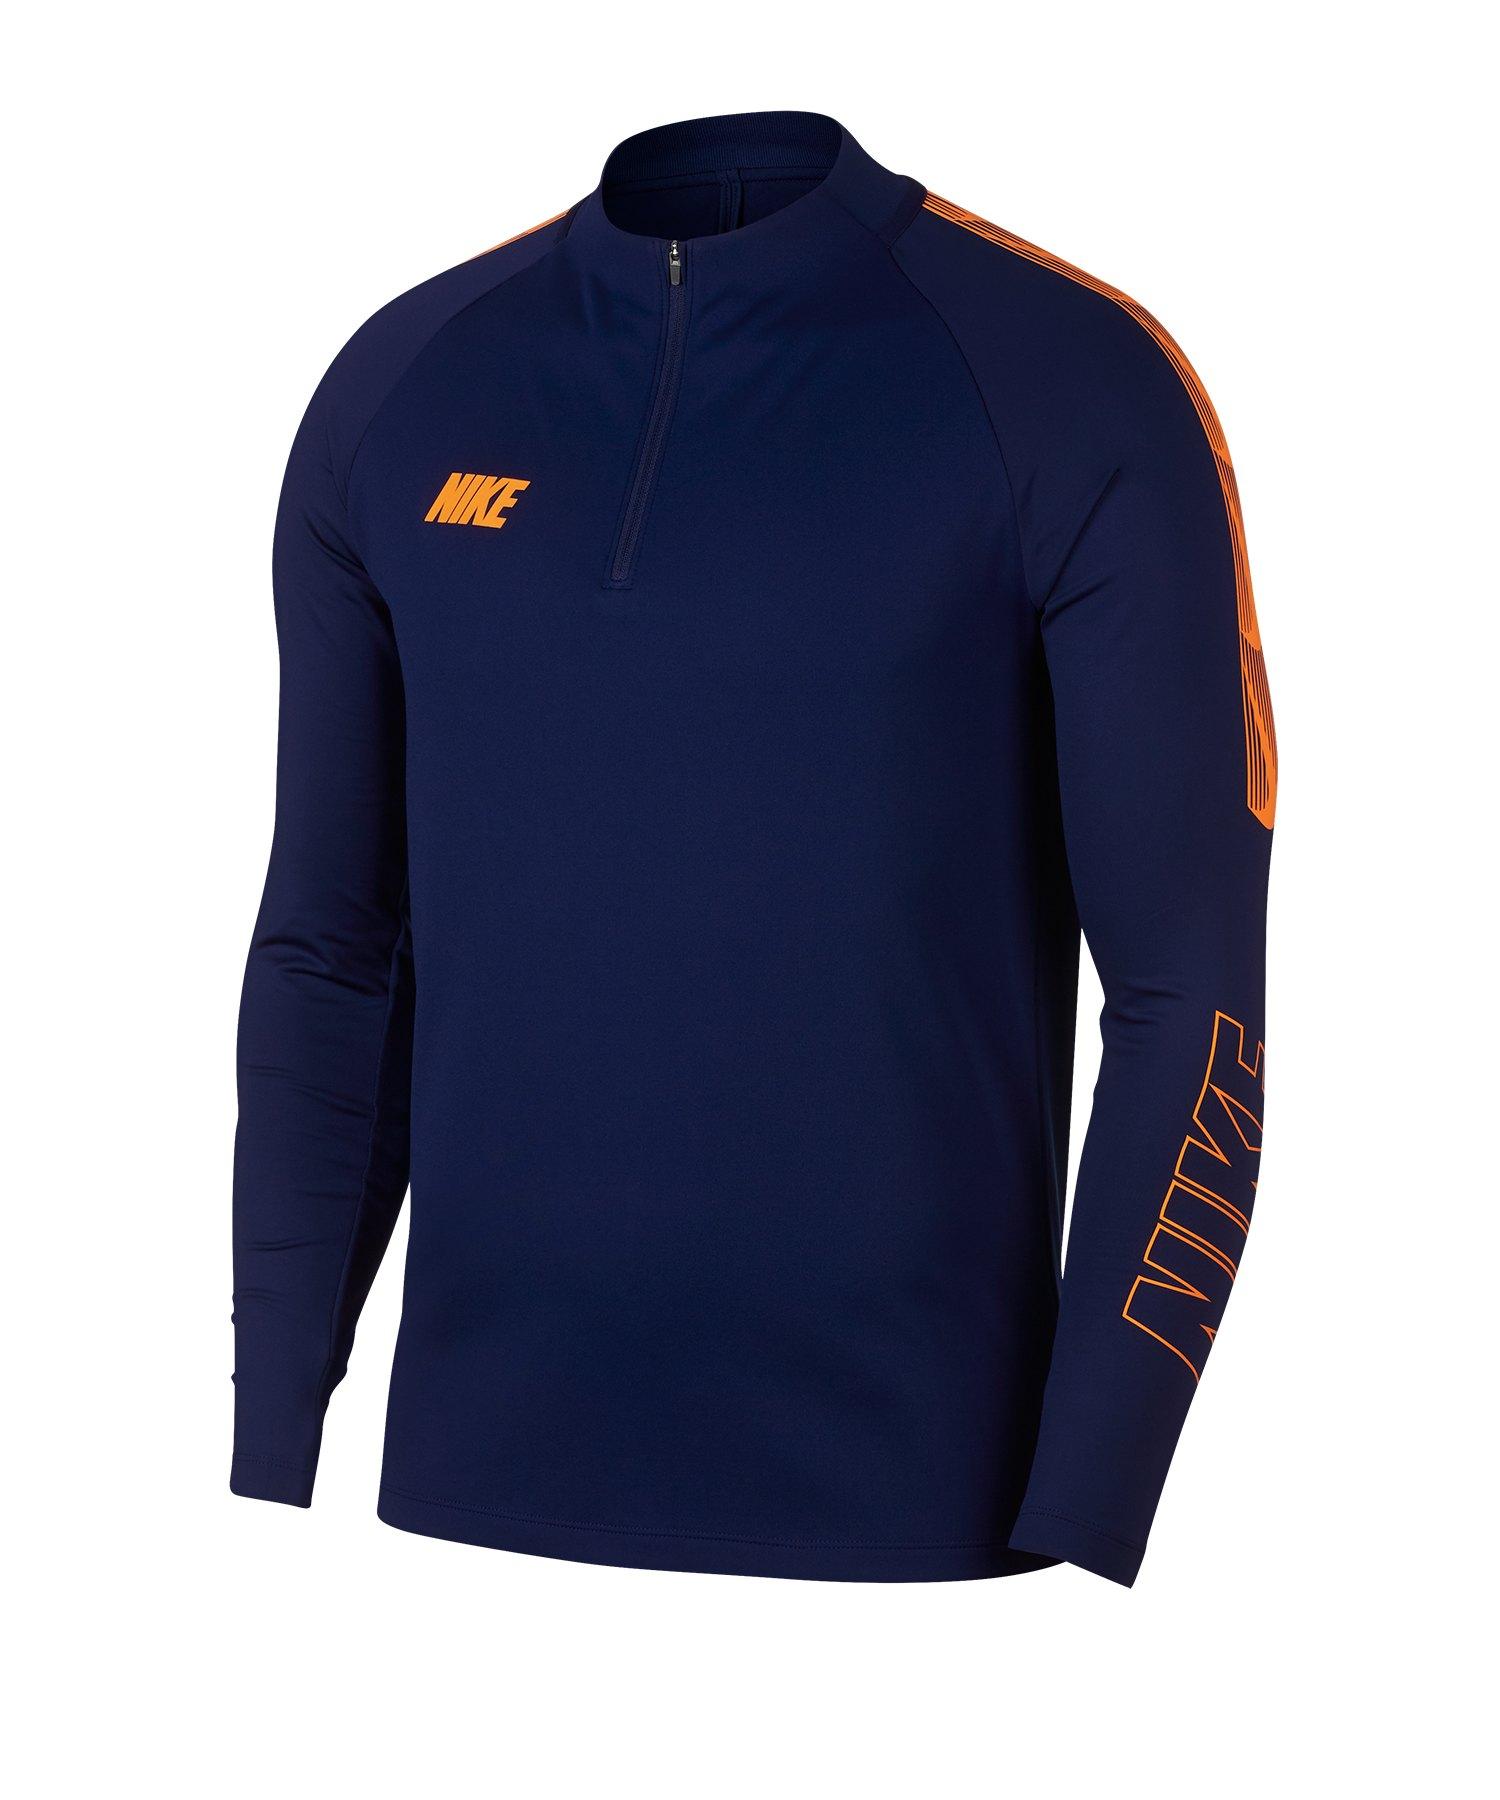 Nike Dry Squad Drill Top Sweatshirt Blau F492 - Blau